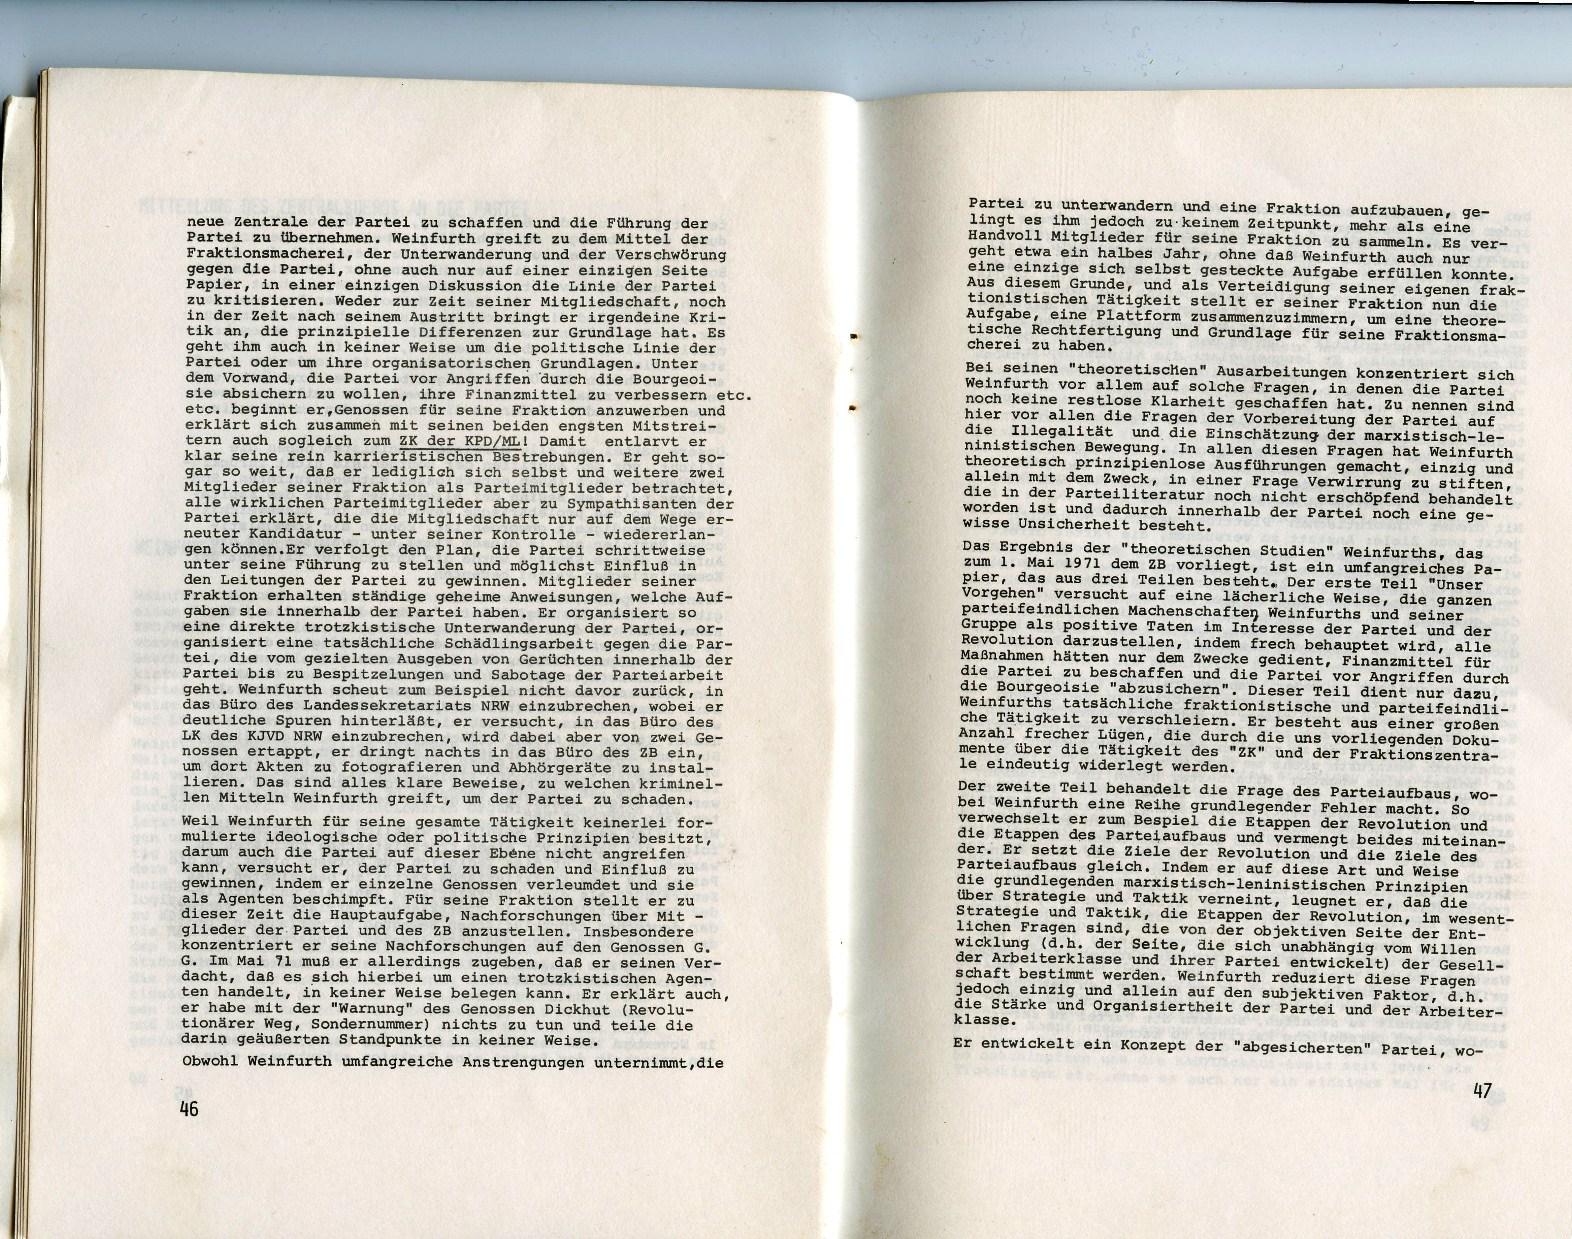 ZB_Parteiarbeiter_1971_09_24